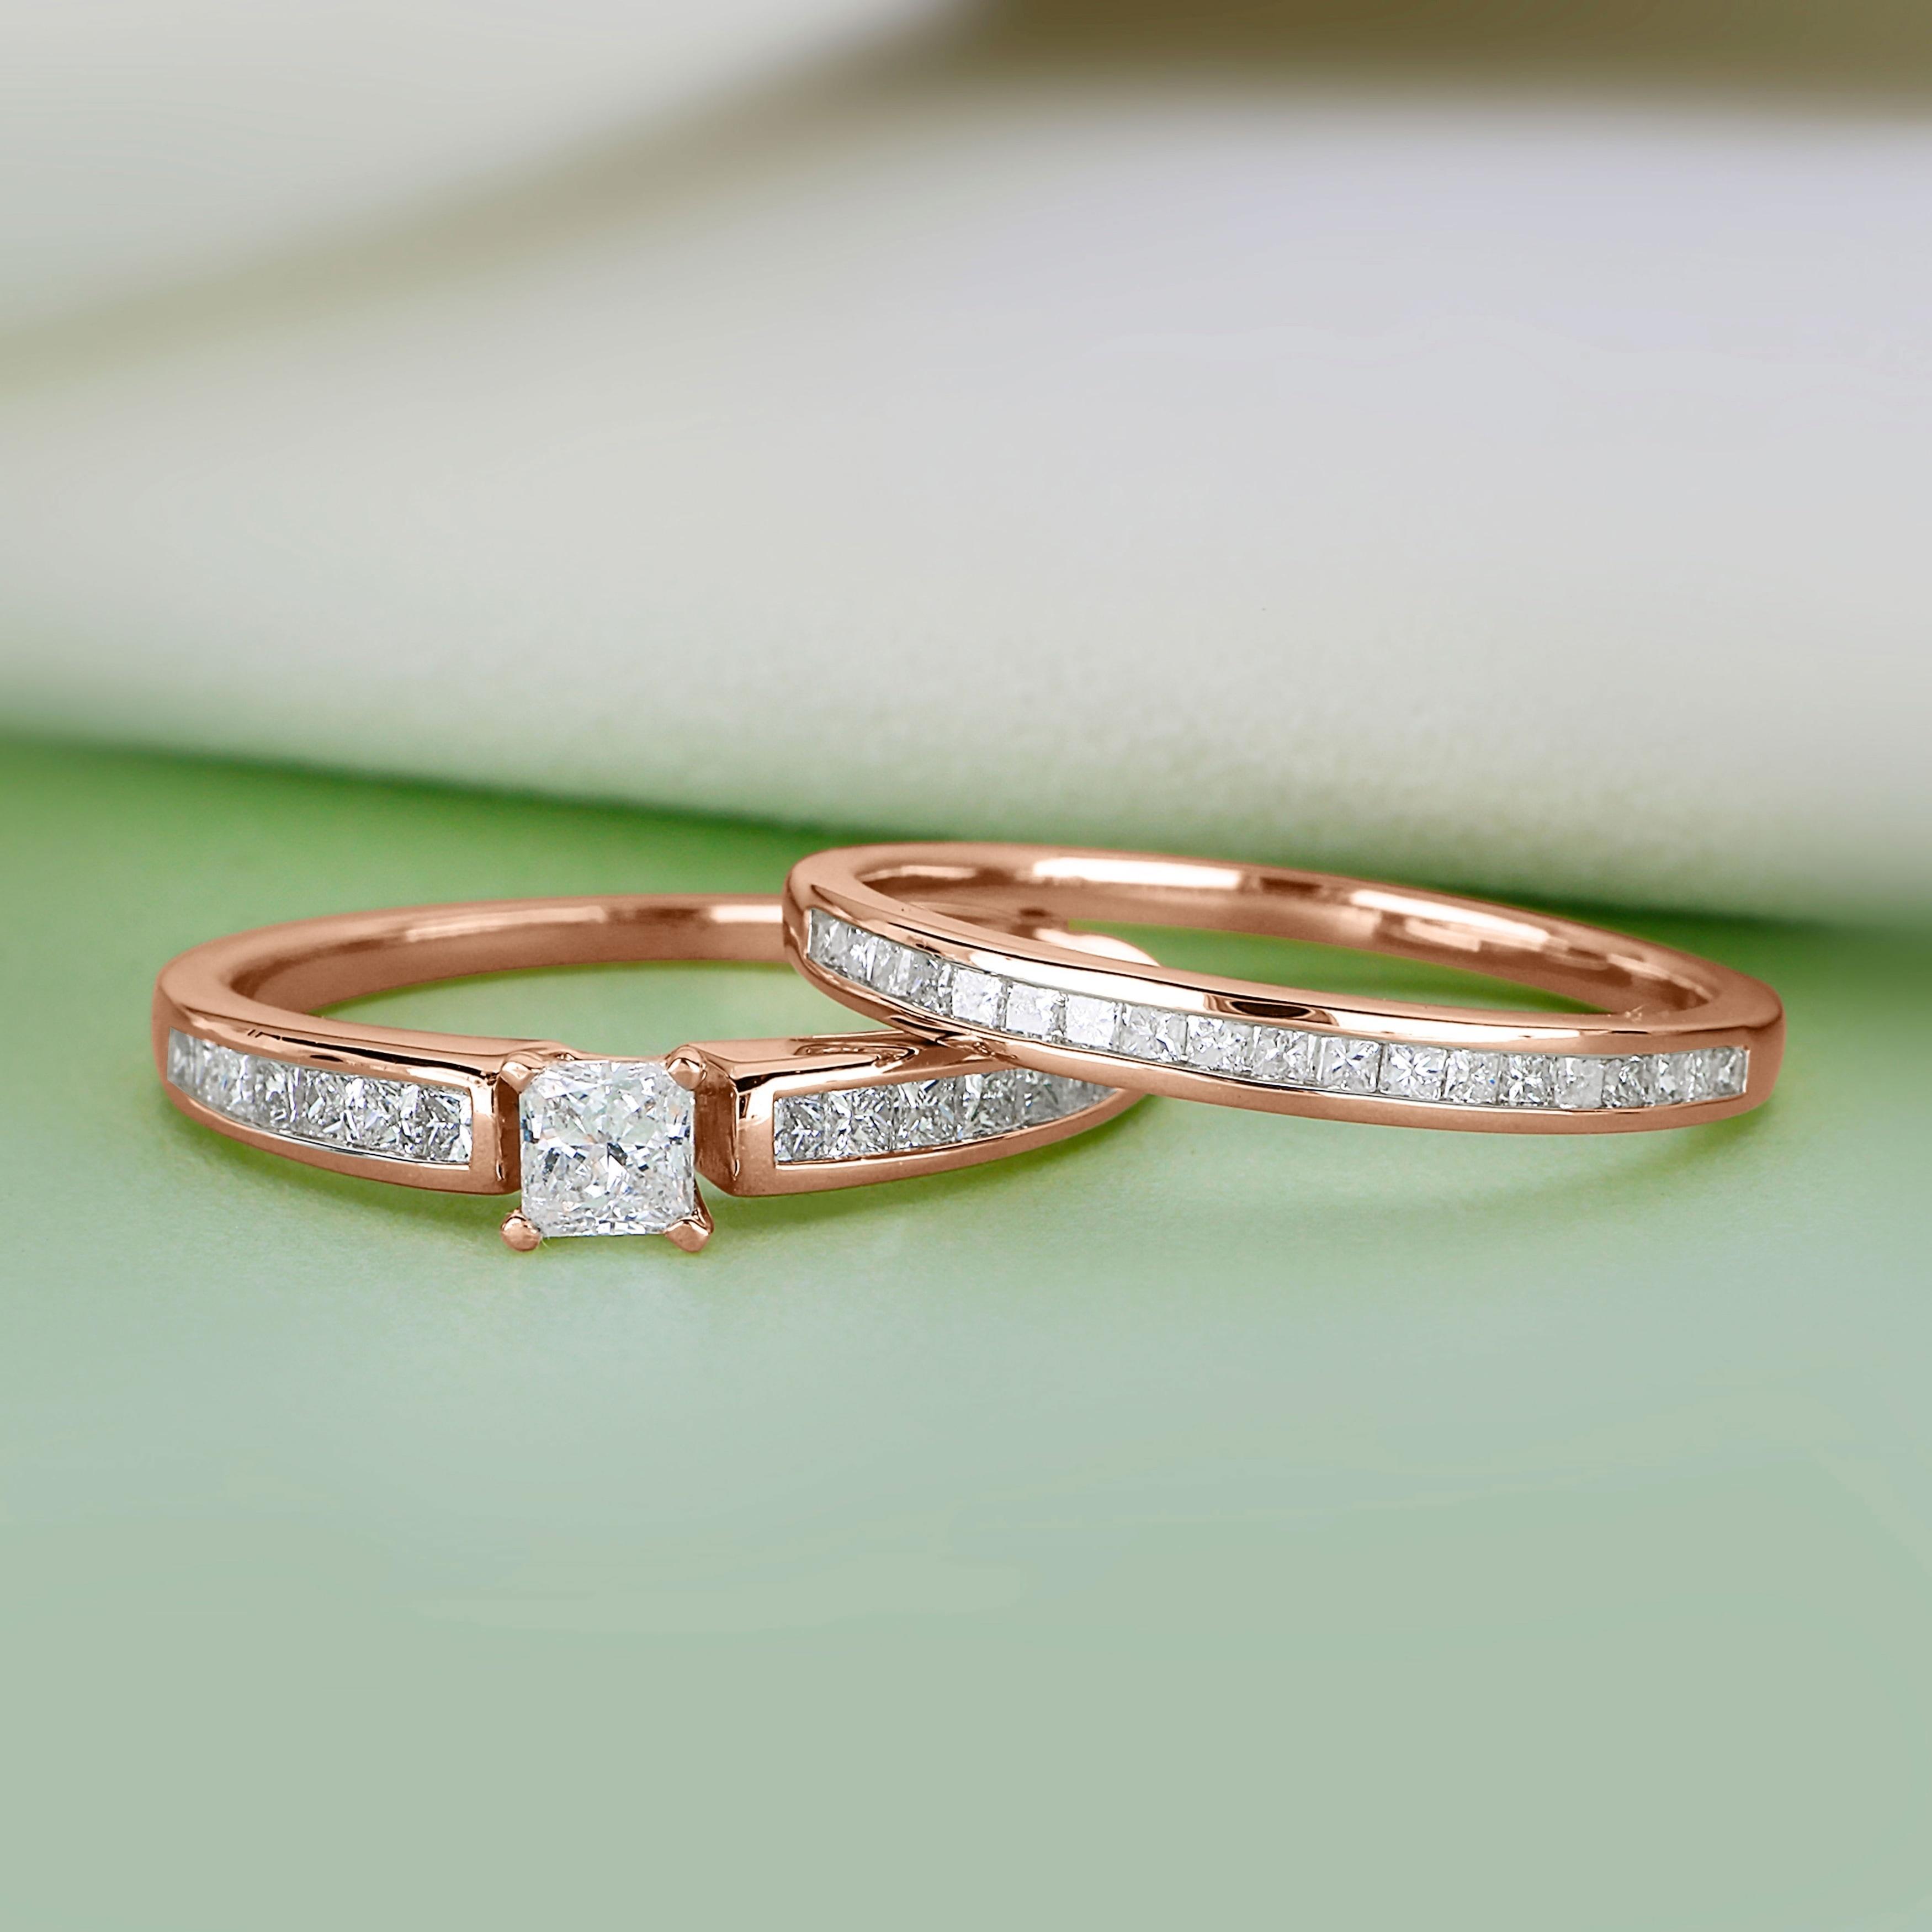 De Couer Igi Certified 14k Rose Gold 1ct Tdw Princess Cut Diamond Engagement Ring Set Overstock 12855941